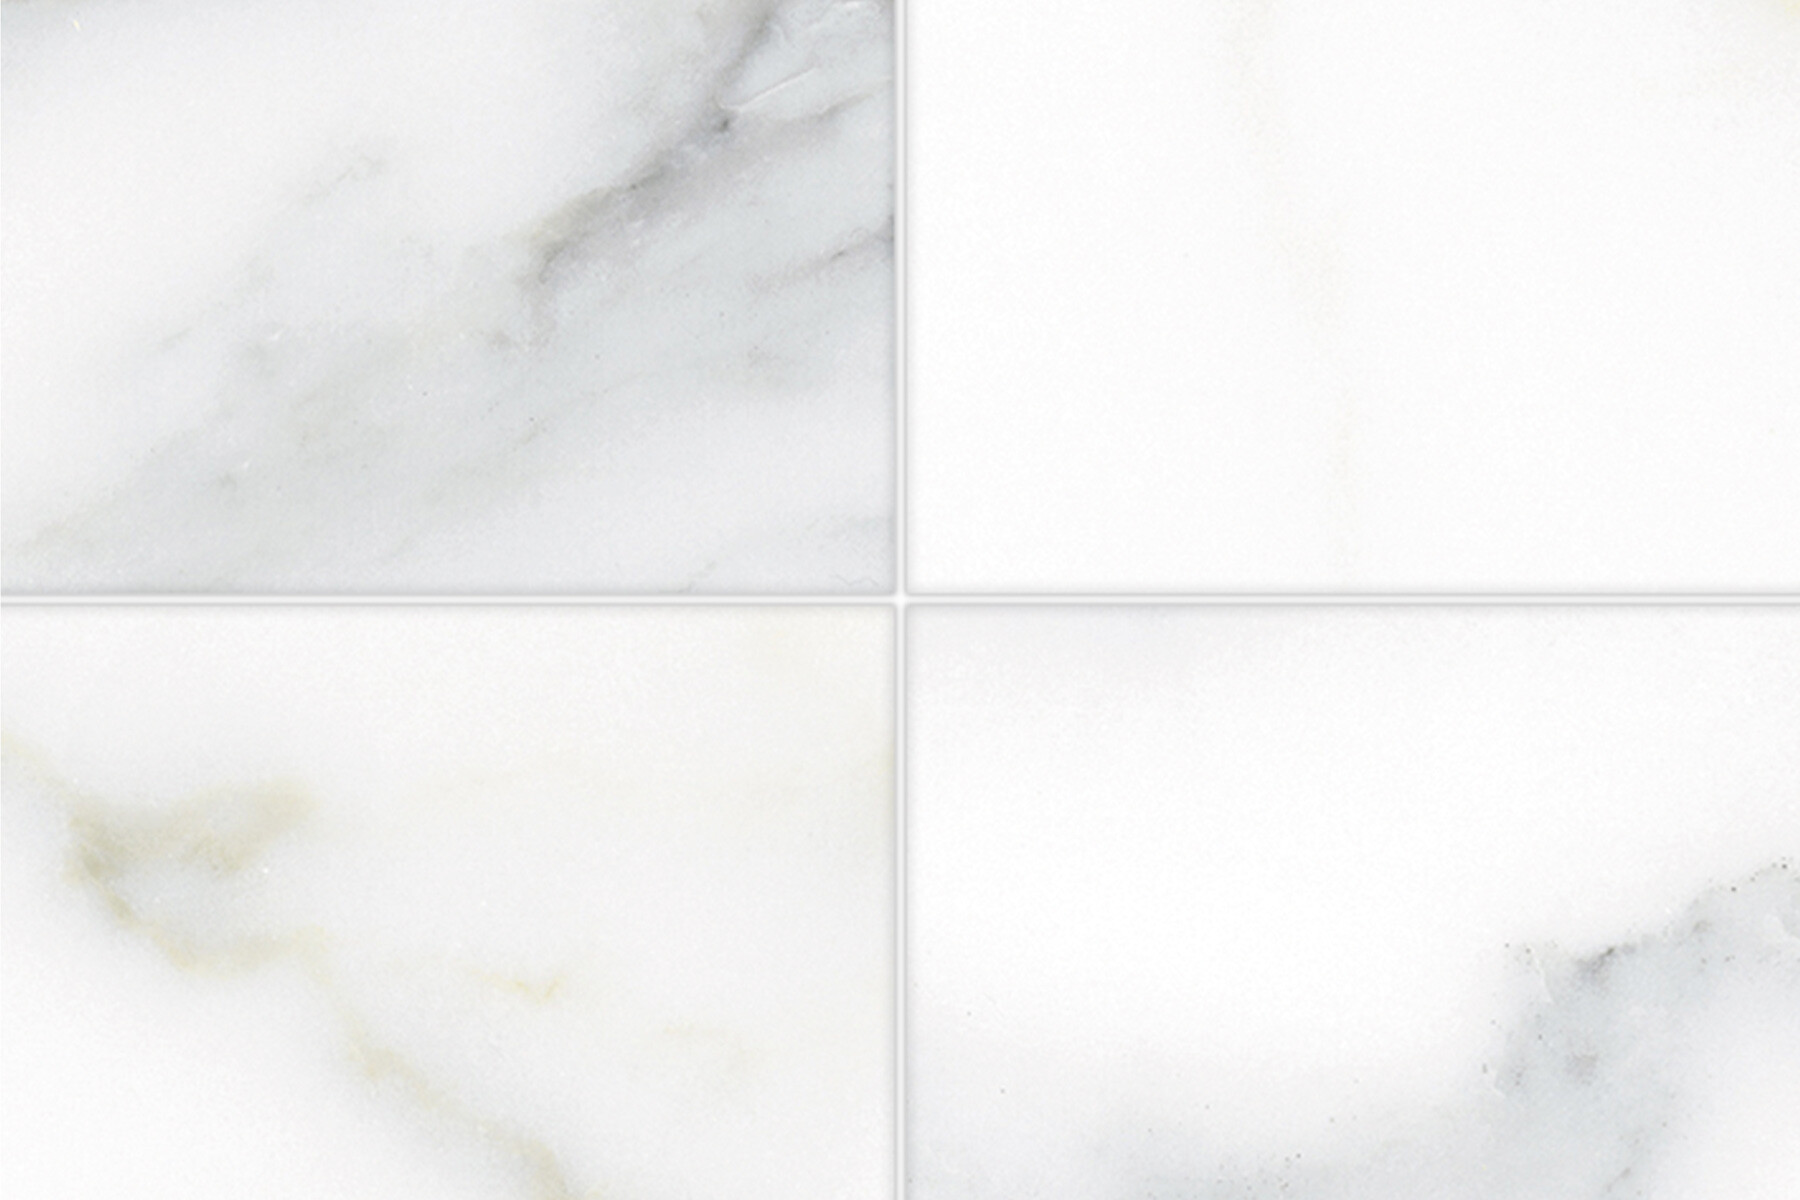 PlateART Duschrückwand mit Motiv Fliesenoptik Marmor Weiß